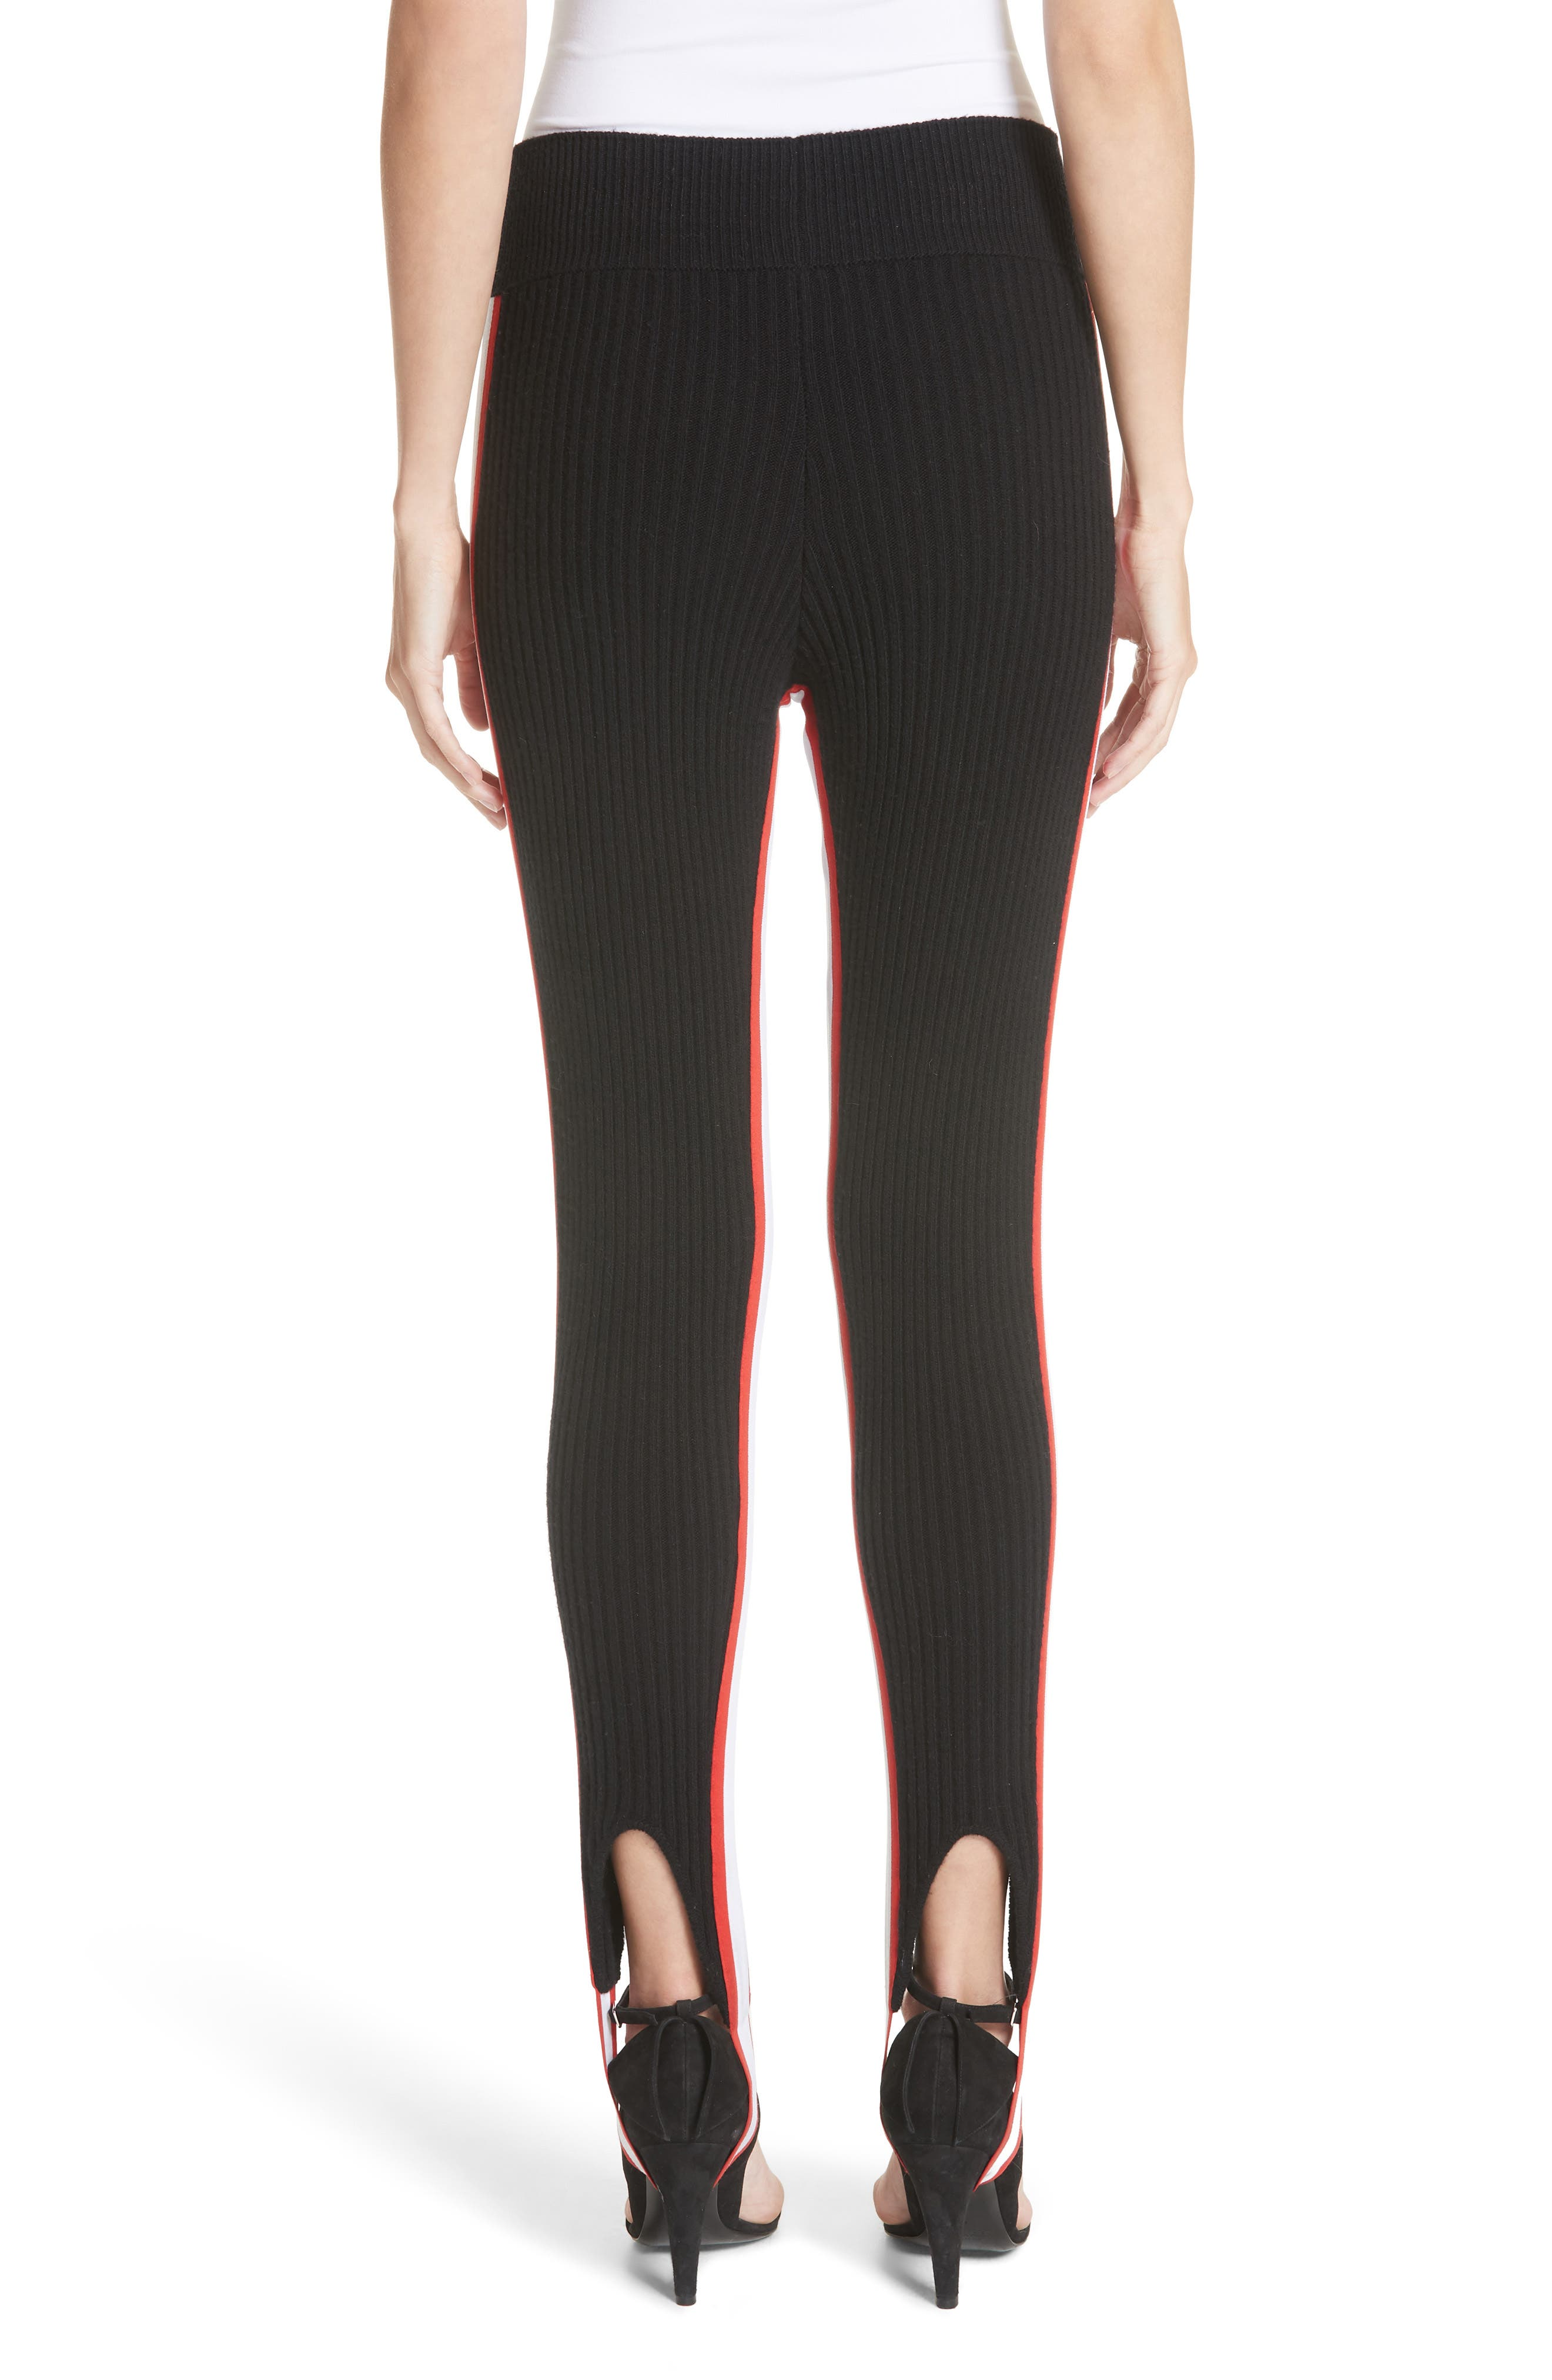 CALVIN KLEIN 205W39NYC,                             Side Stripe Stretch Wool Stirrup Leggings,                             Alternate thumbnail 2, color,                             001